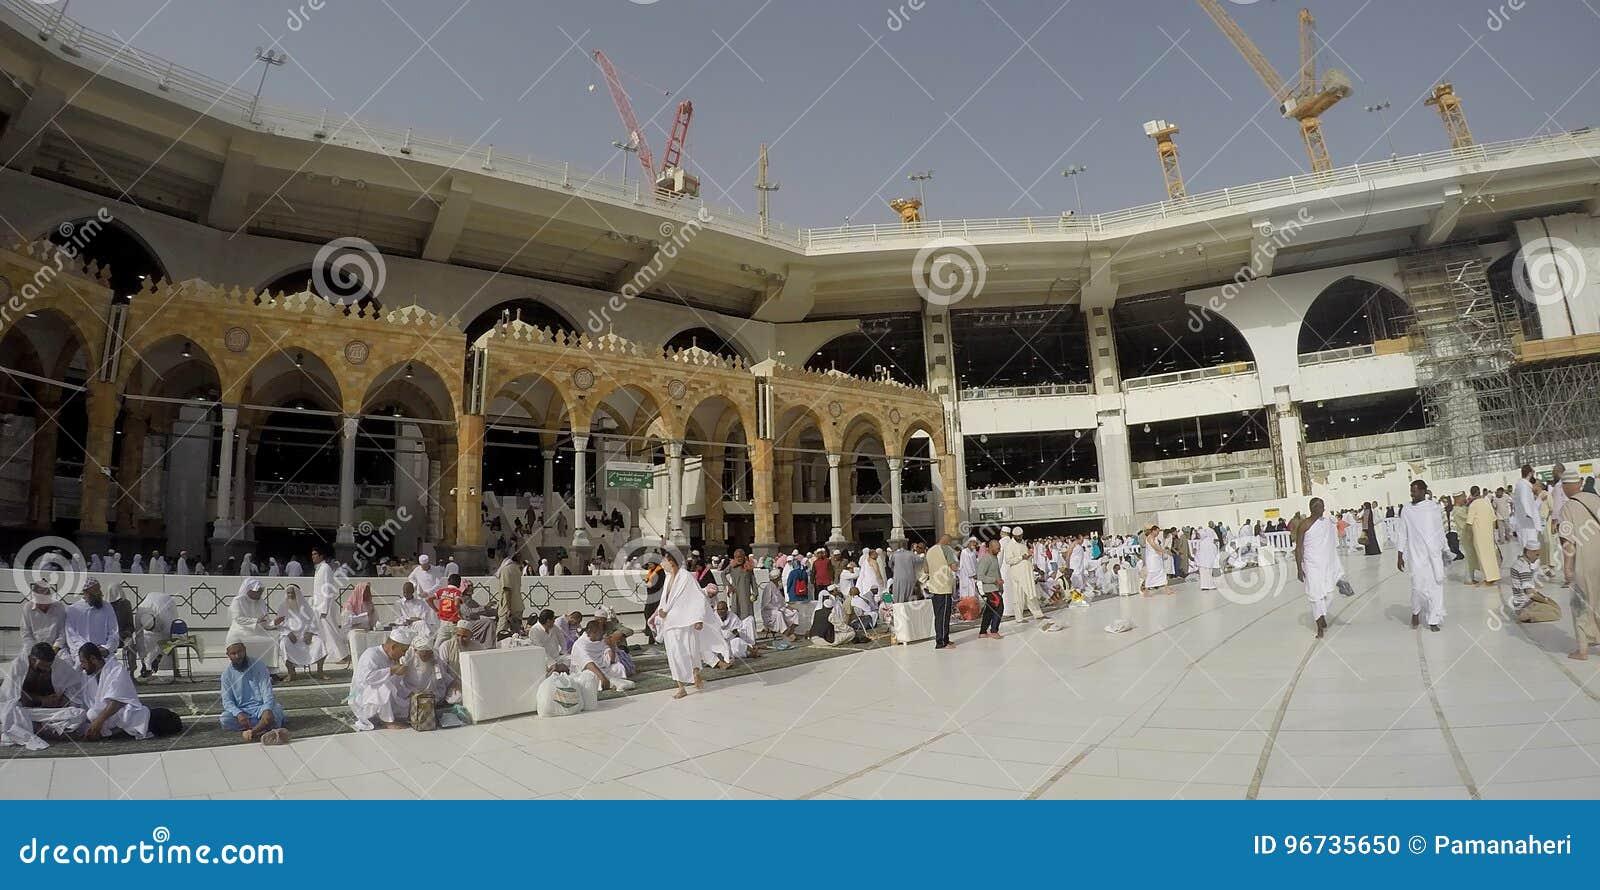 Panorama View Inside Haram Mosque